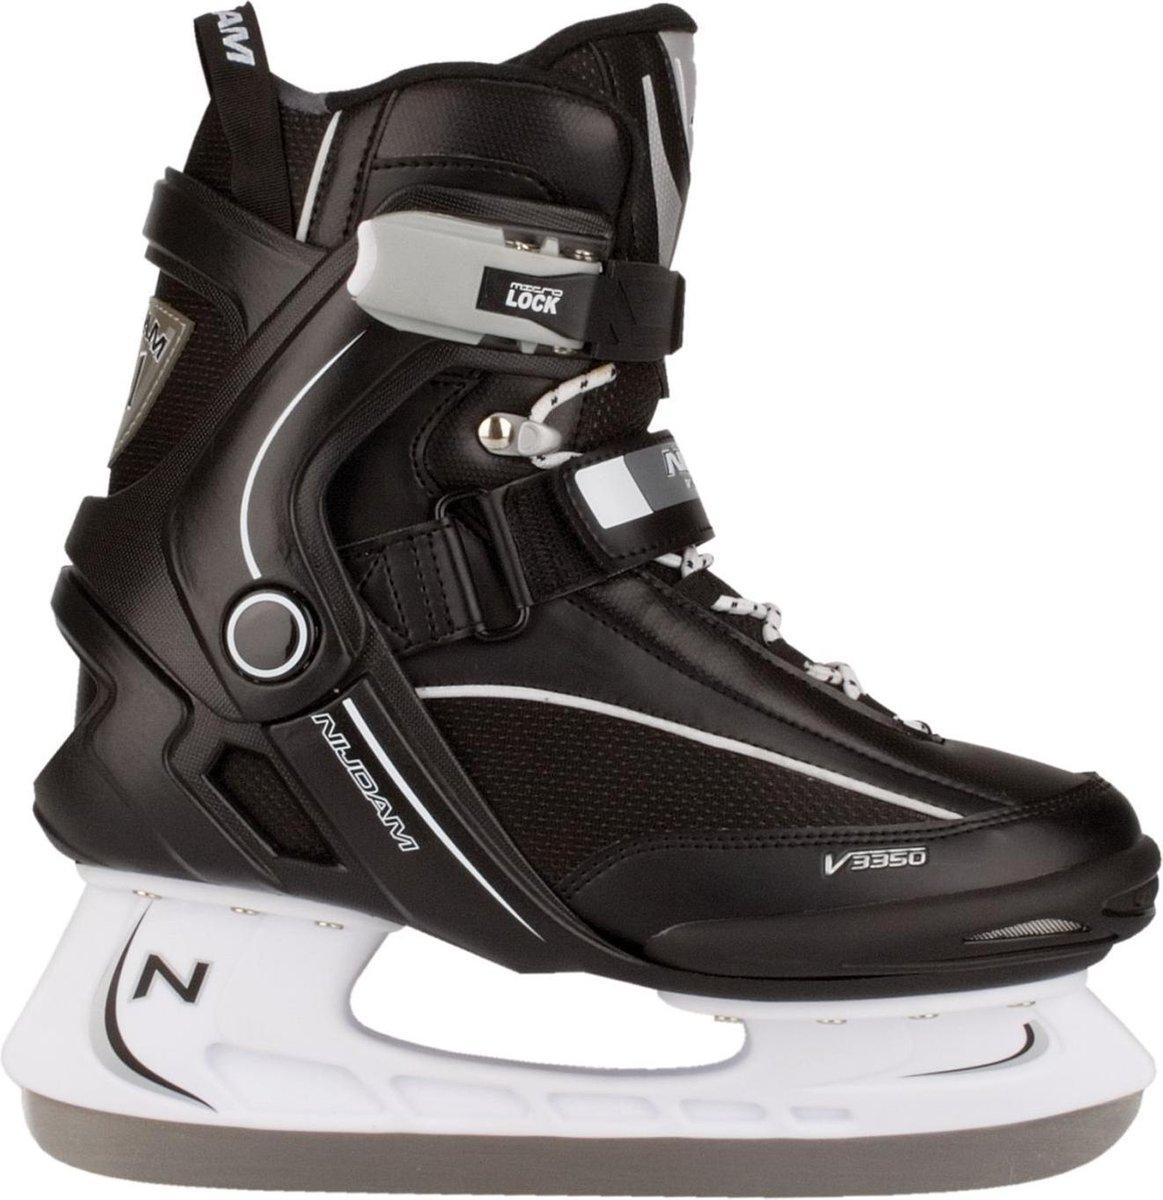 Nijdam IJshockeyschaats - Semi-Softboot - Zwart/Wit - Maat 45